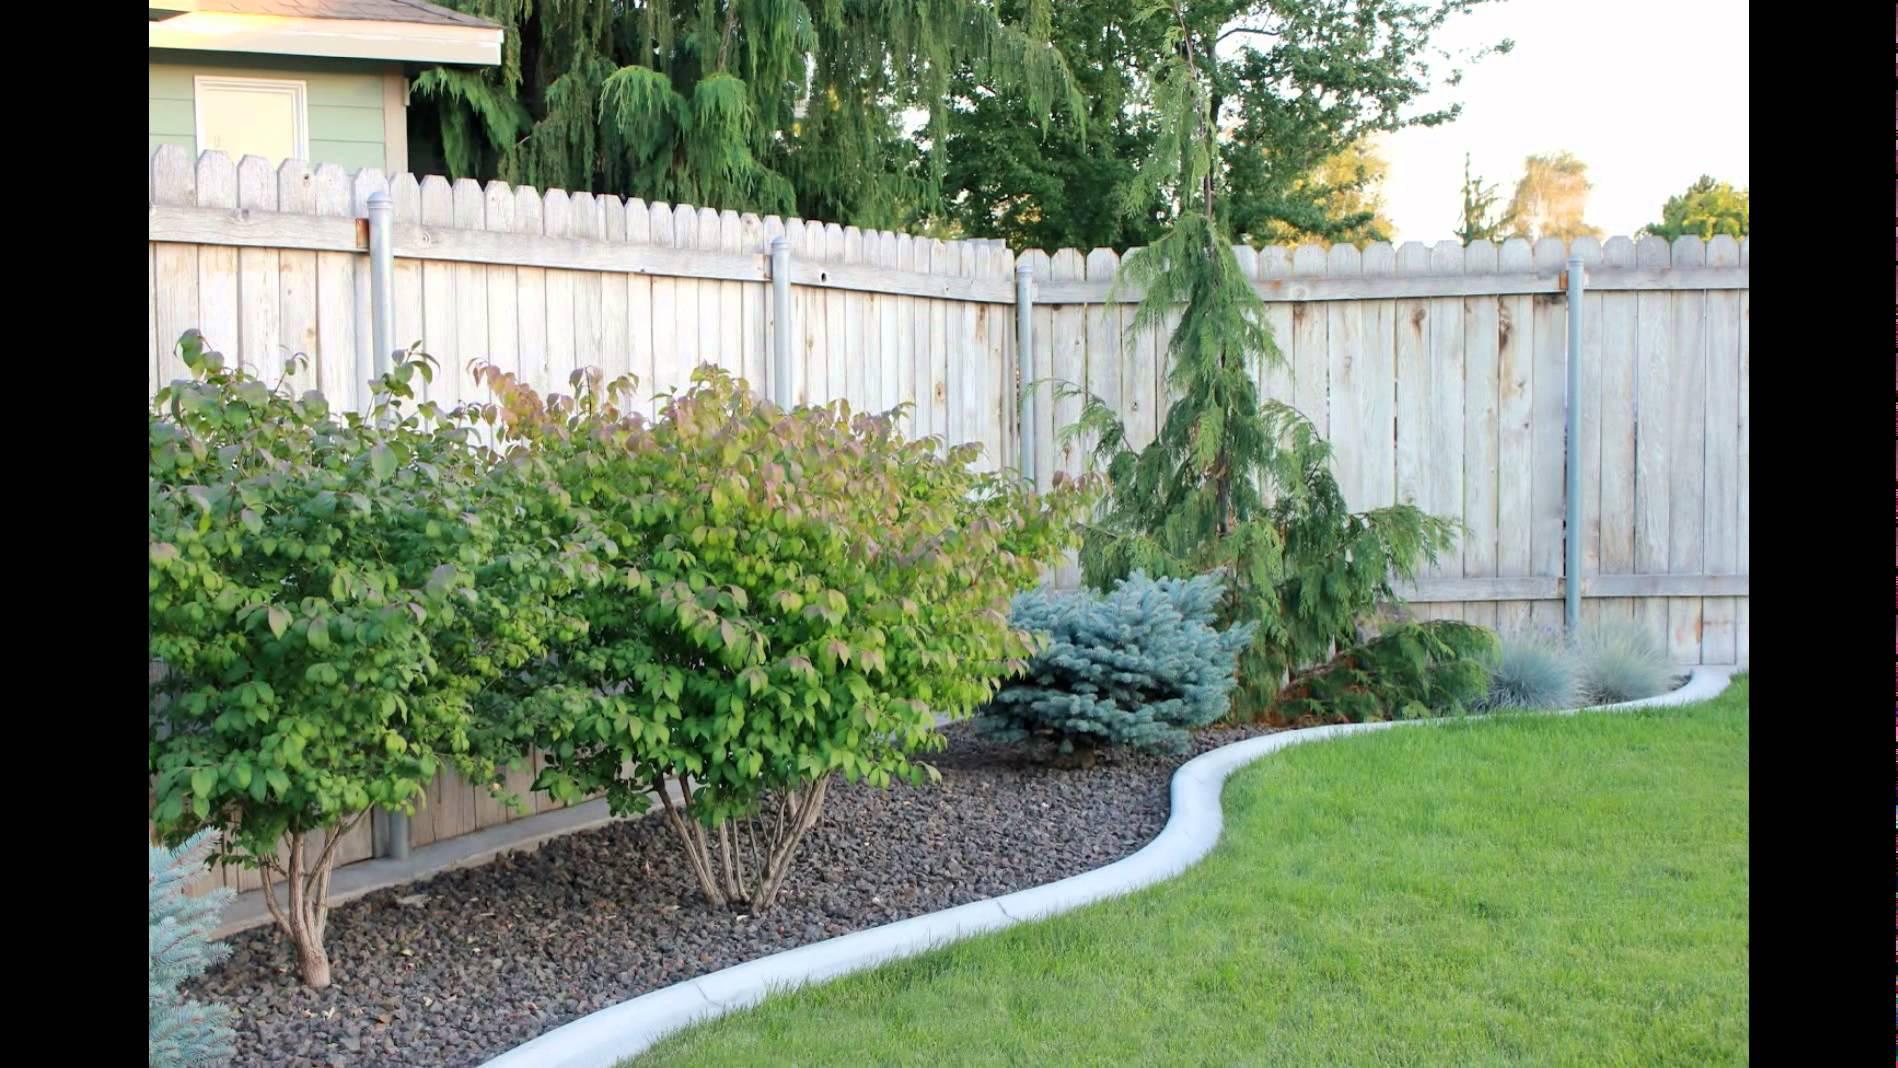 landscape designs backyard backyard landscaping designs | small backyard landscaping designs - youtube DEQKTOO